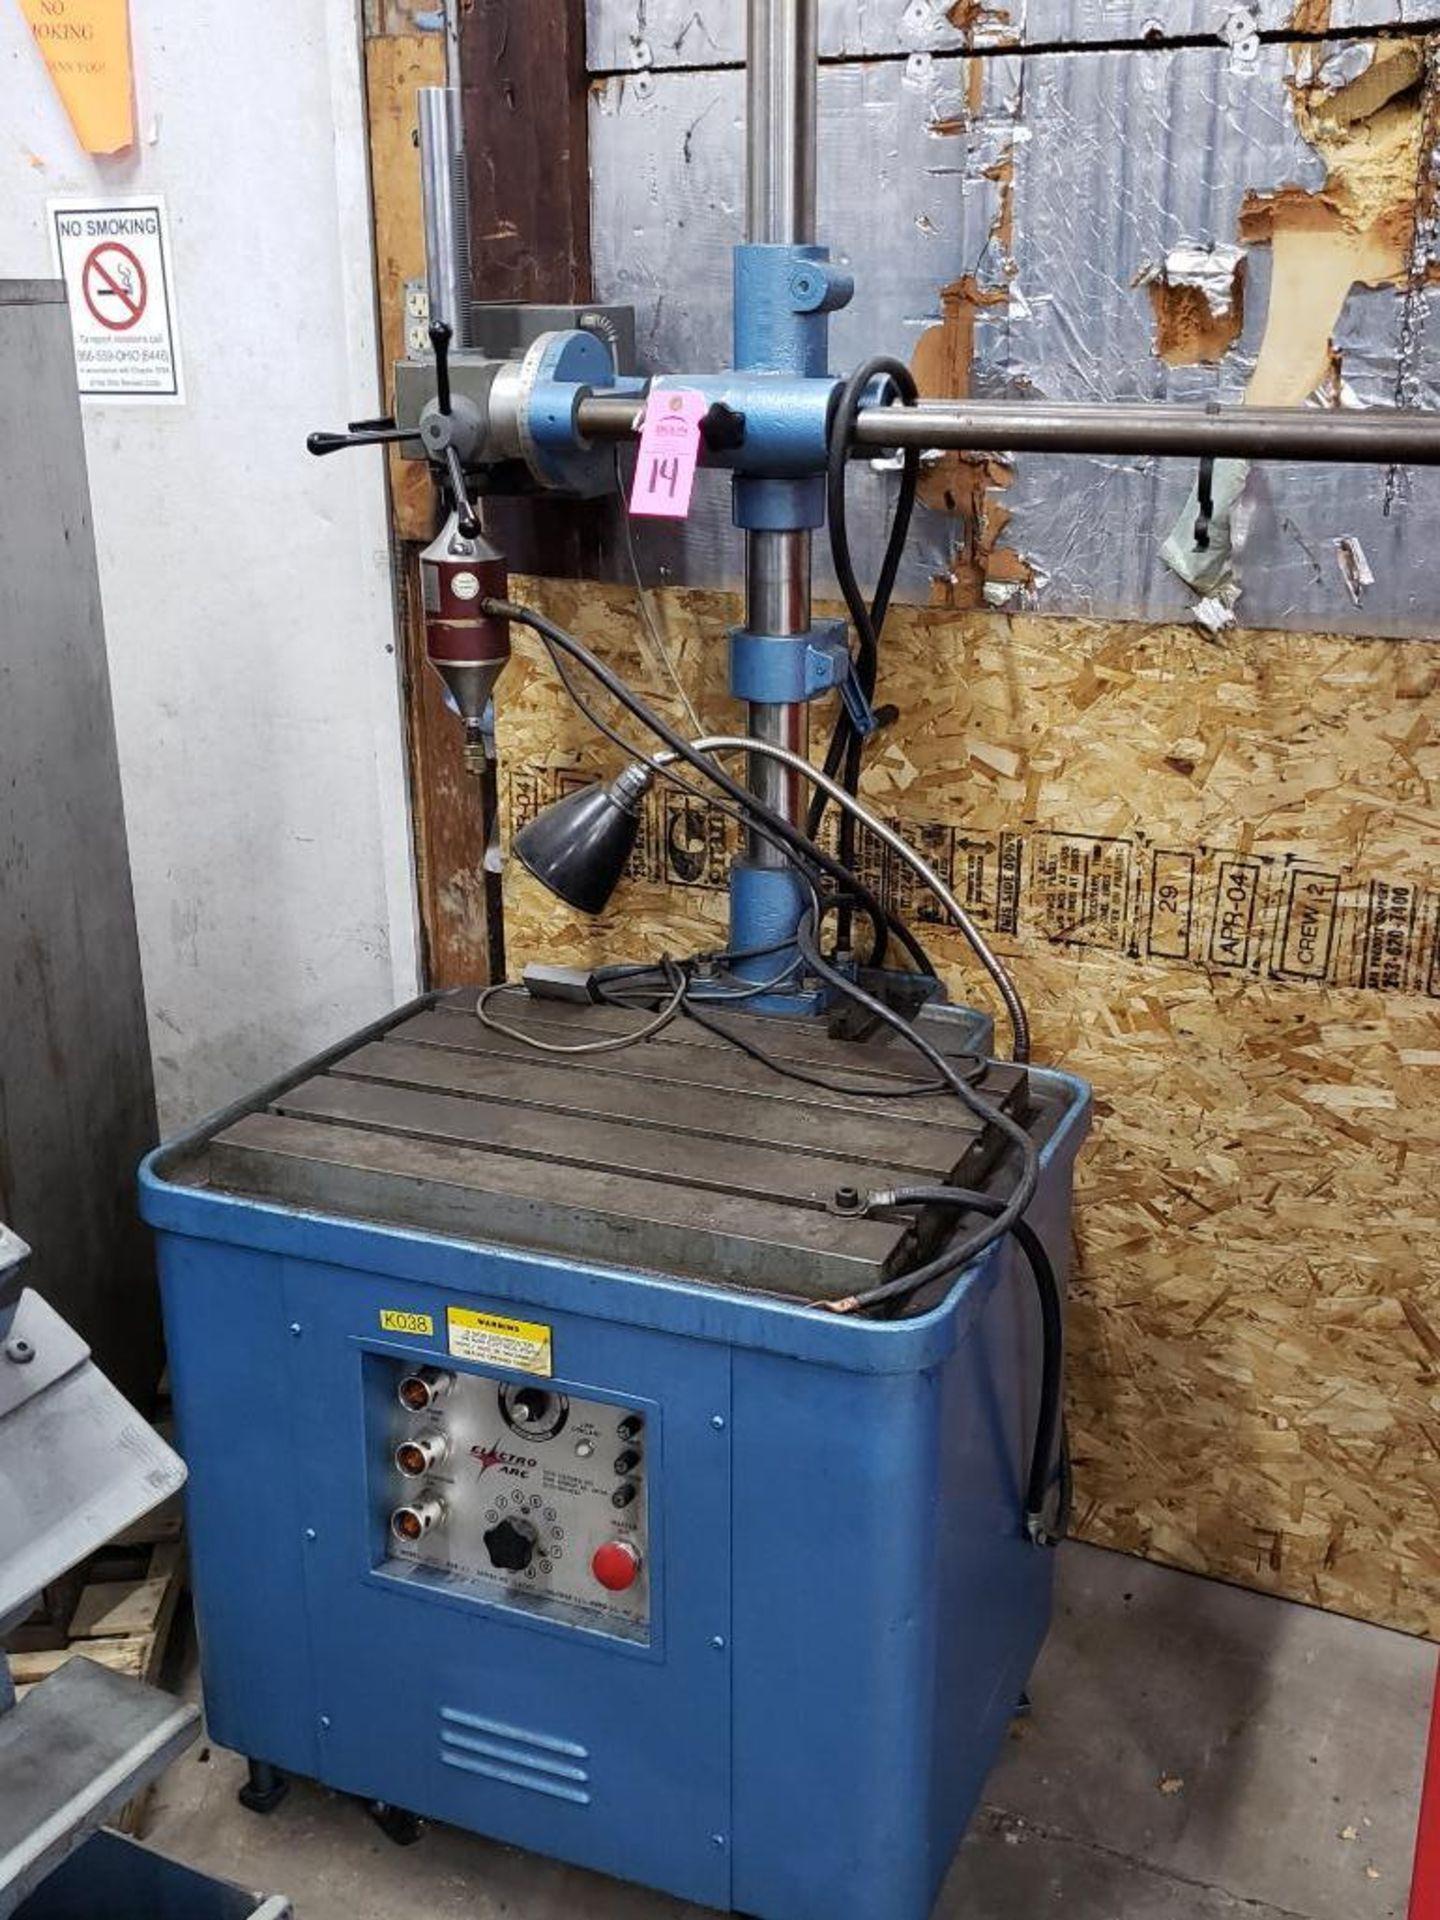 Lot 14 - Electro Arc model 20BT metal disintegrator tap extractor. 10kVa, 220v, serial number 12686.